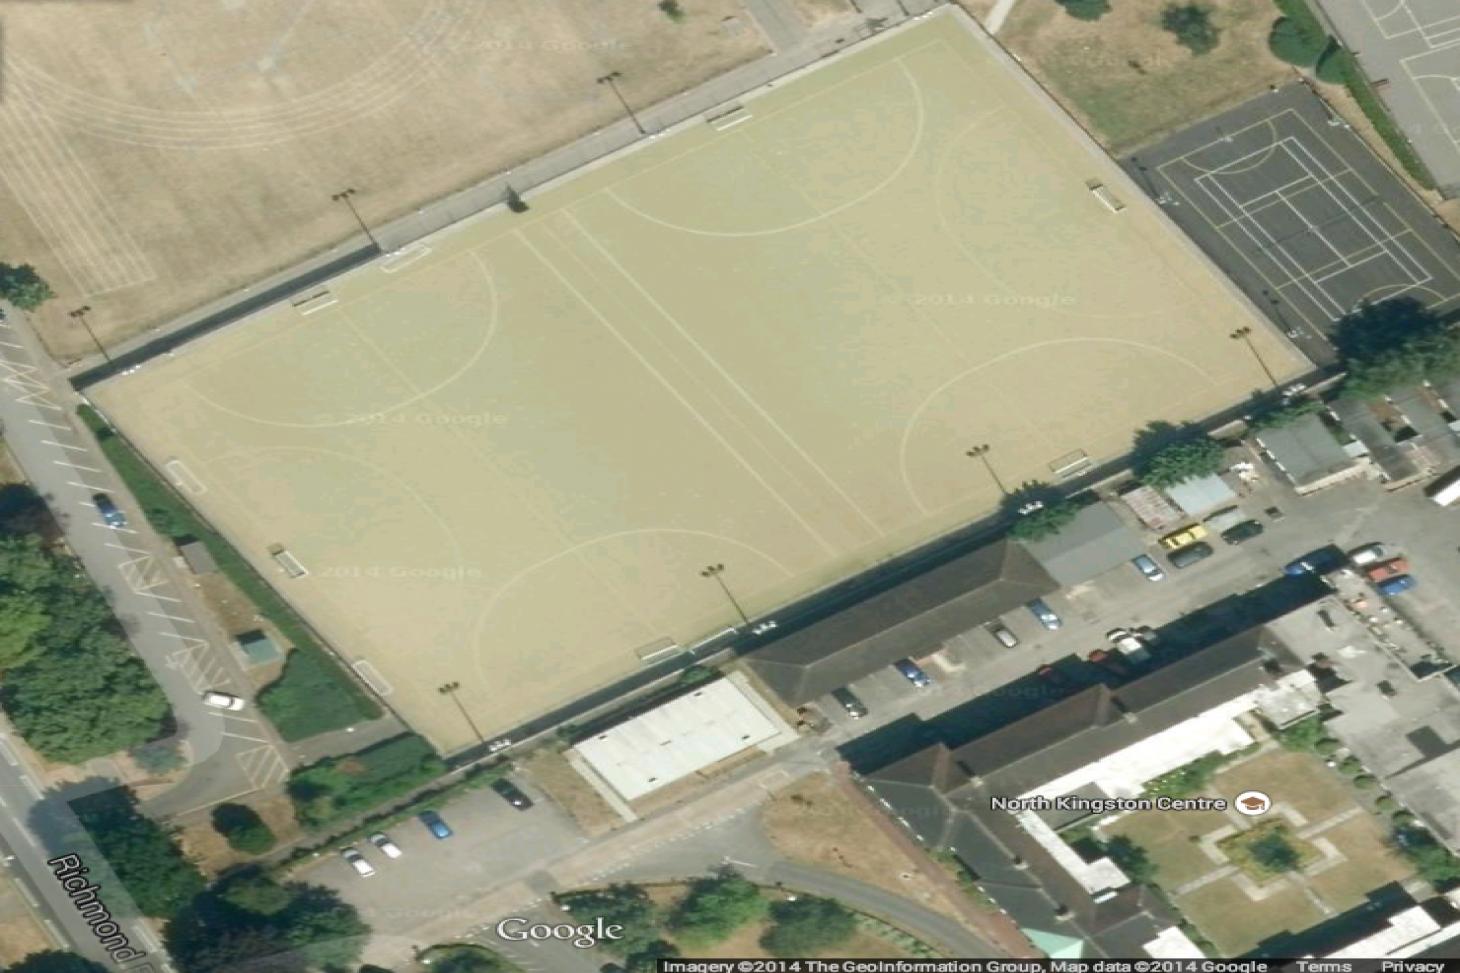 Tiffin Girls School Community Sports Centre 5 a side | 3G Astroturf football pitch